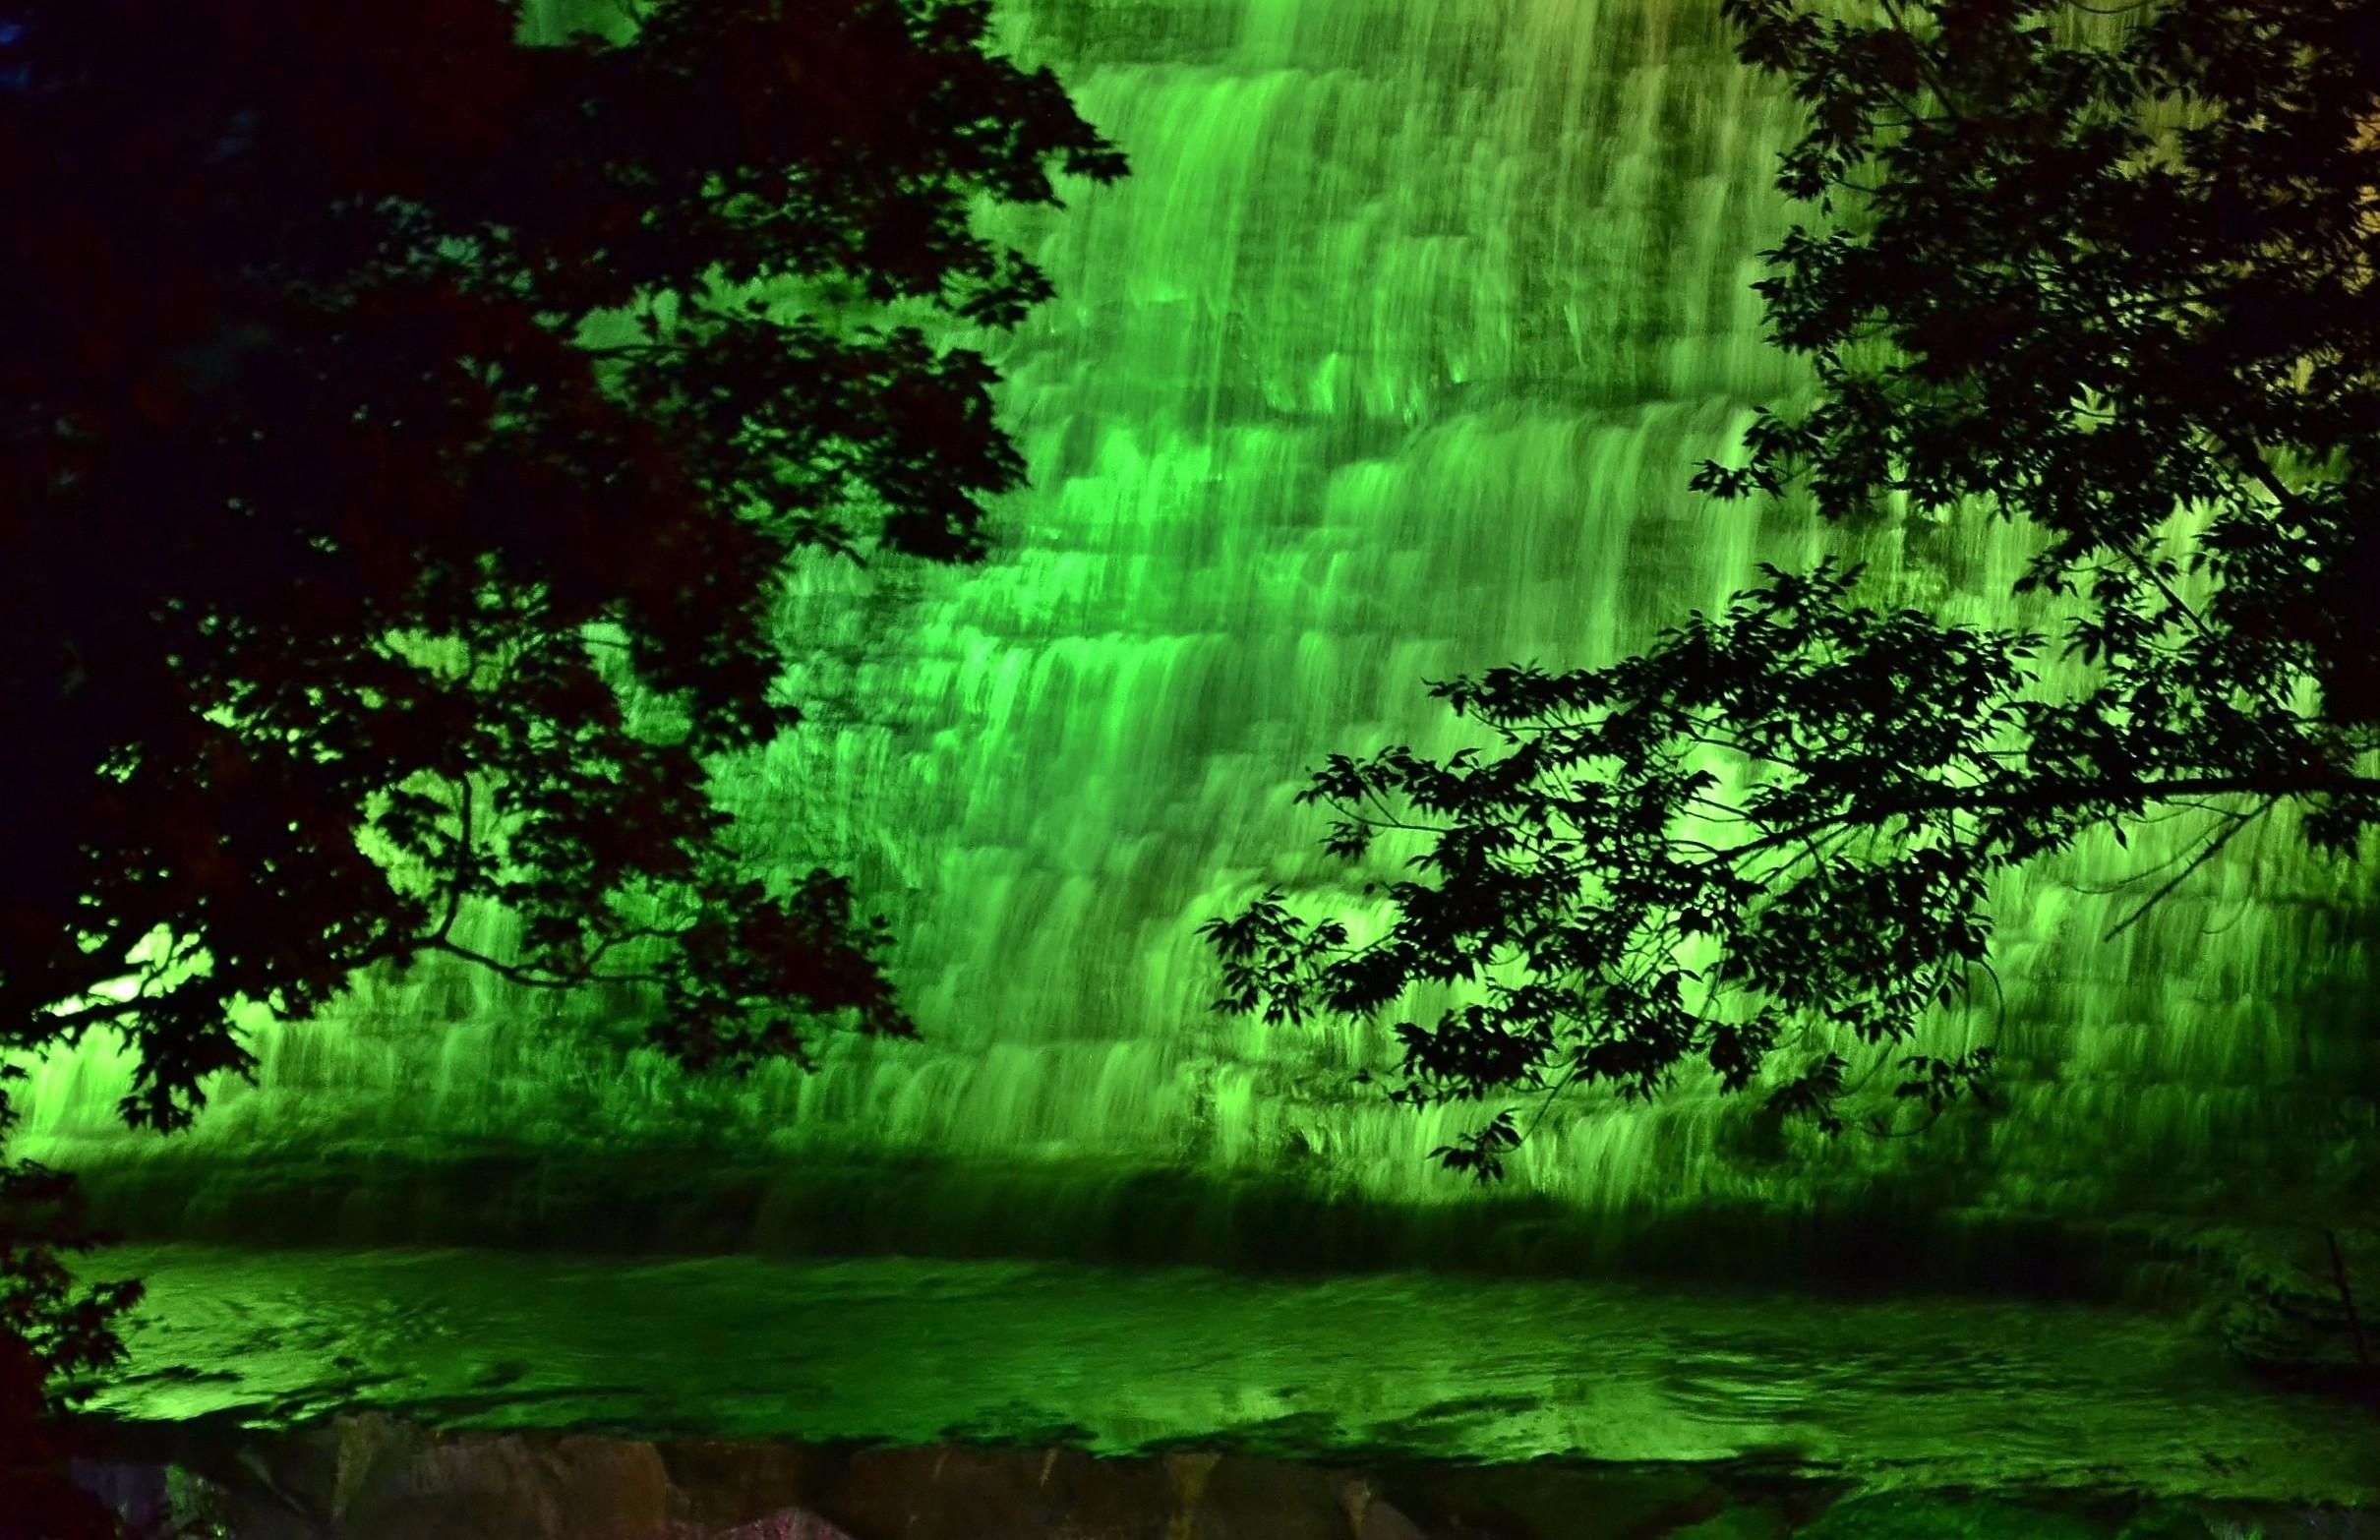 Albion Falls illuminated in Green